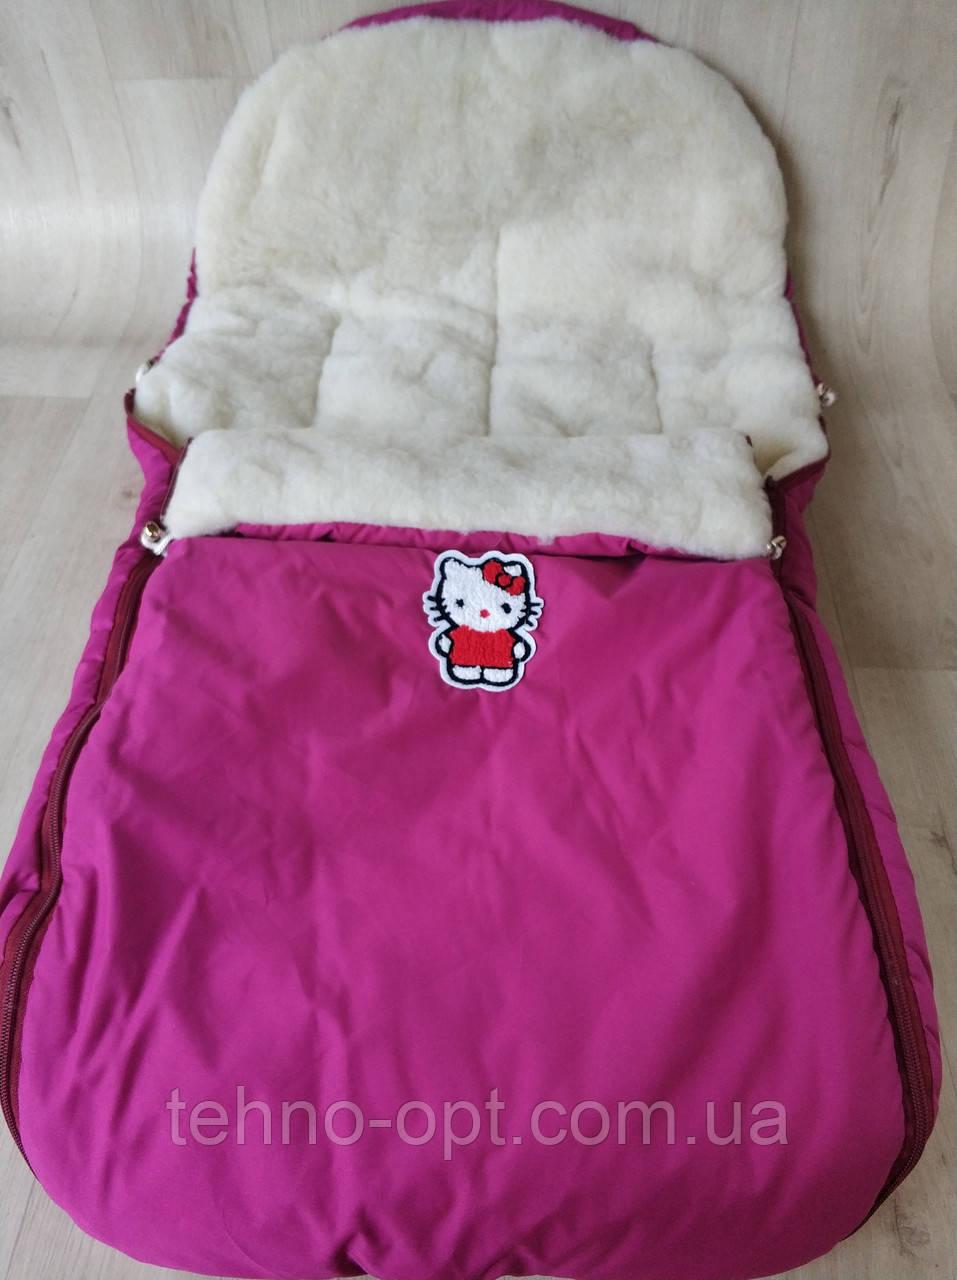 Конверт чехол на овчине в коляску санки розовый